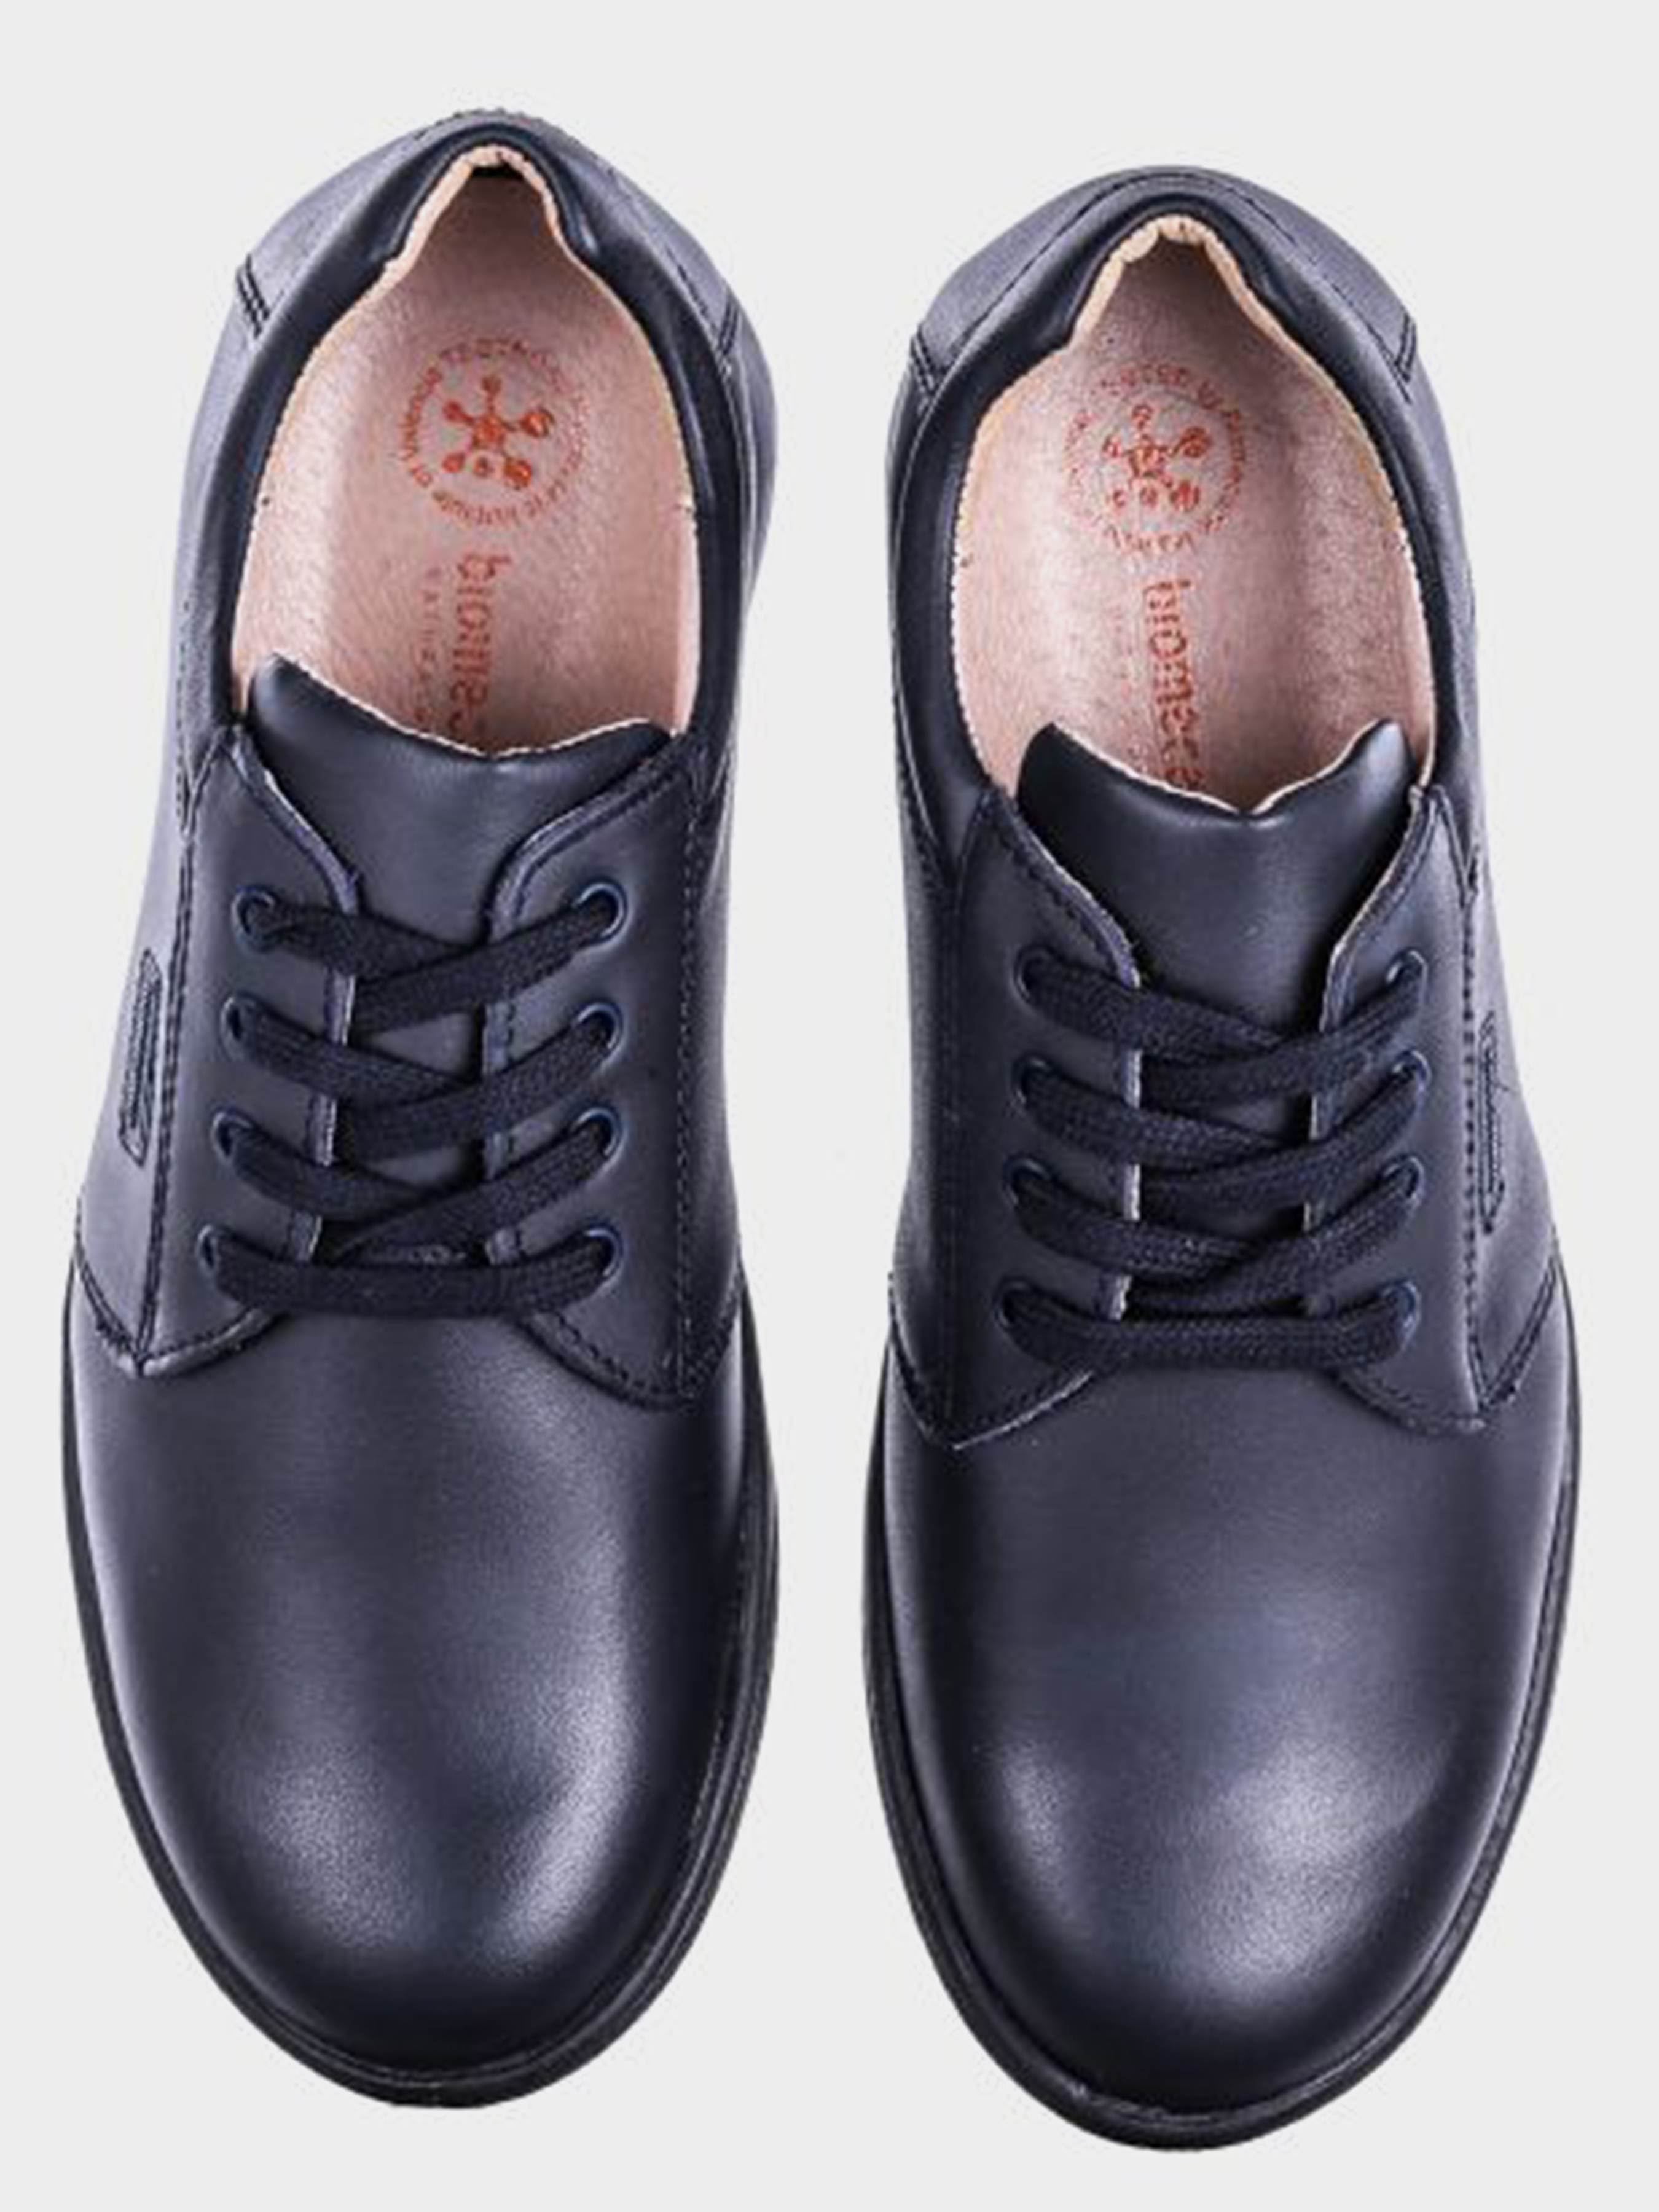 Ботинки для детей Biomecanics AZUL MARINO (NAPA) YV321 продажа, 2017